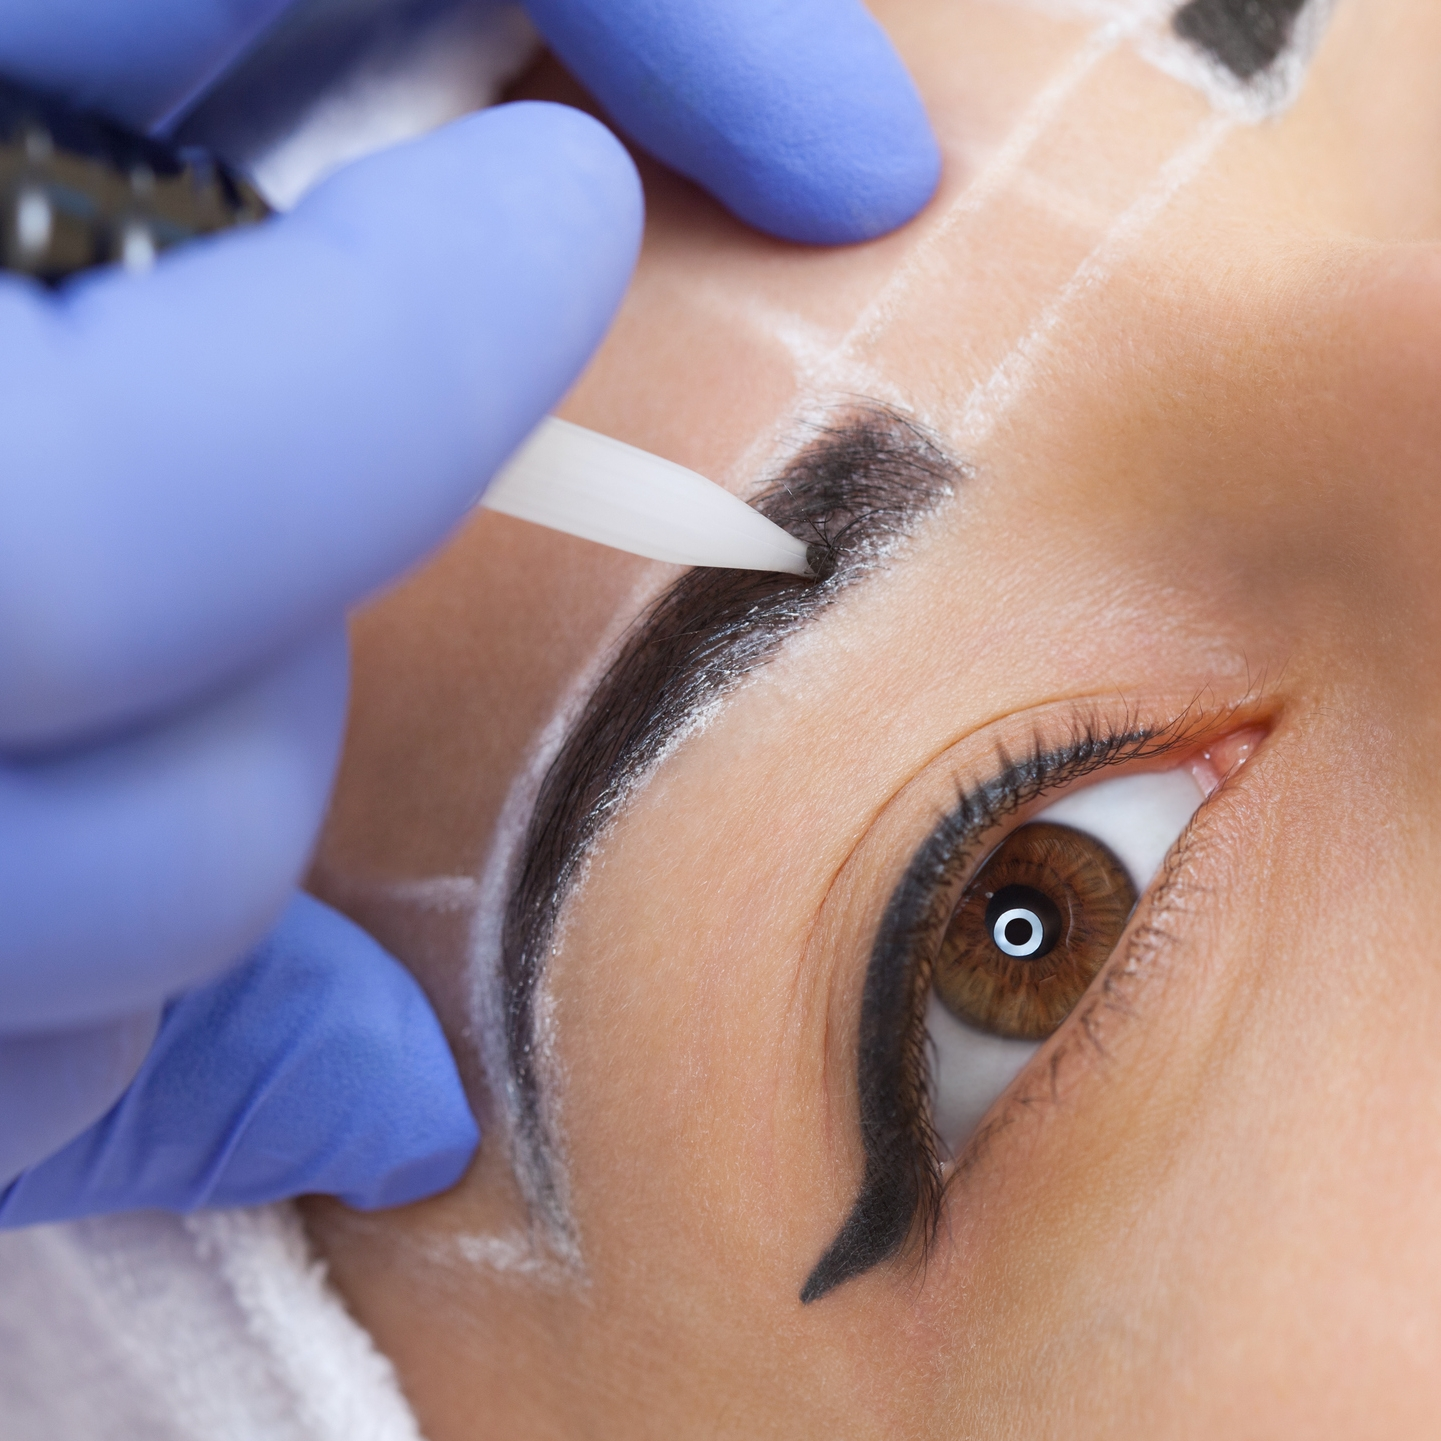 EPermanent Powder Eyebrow Tattoo Permanent Makeup Near Me